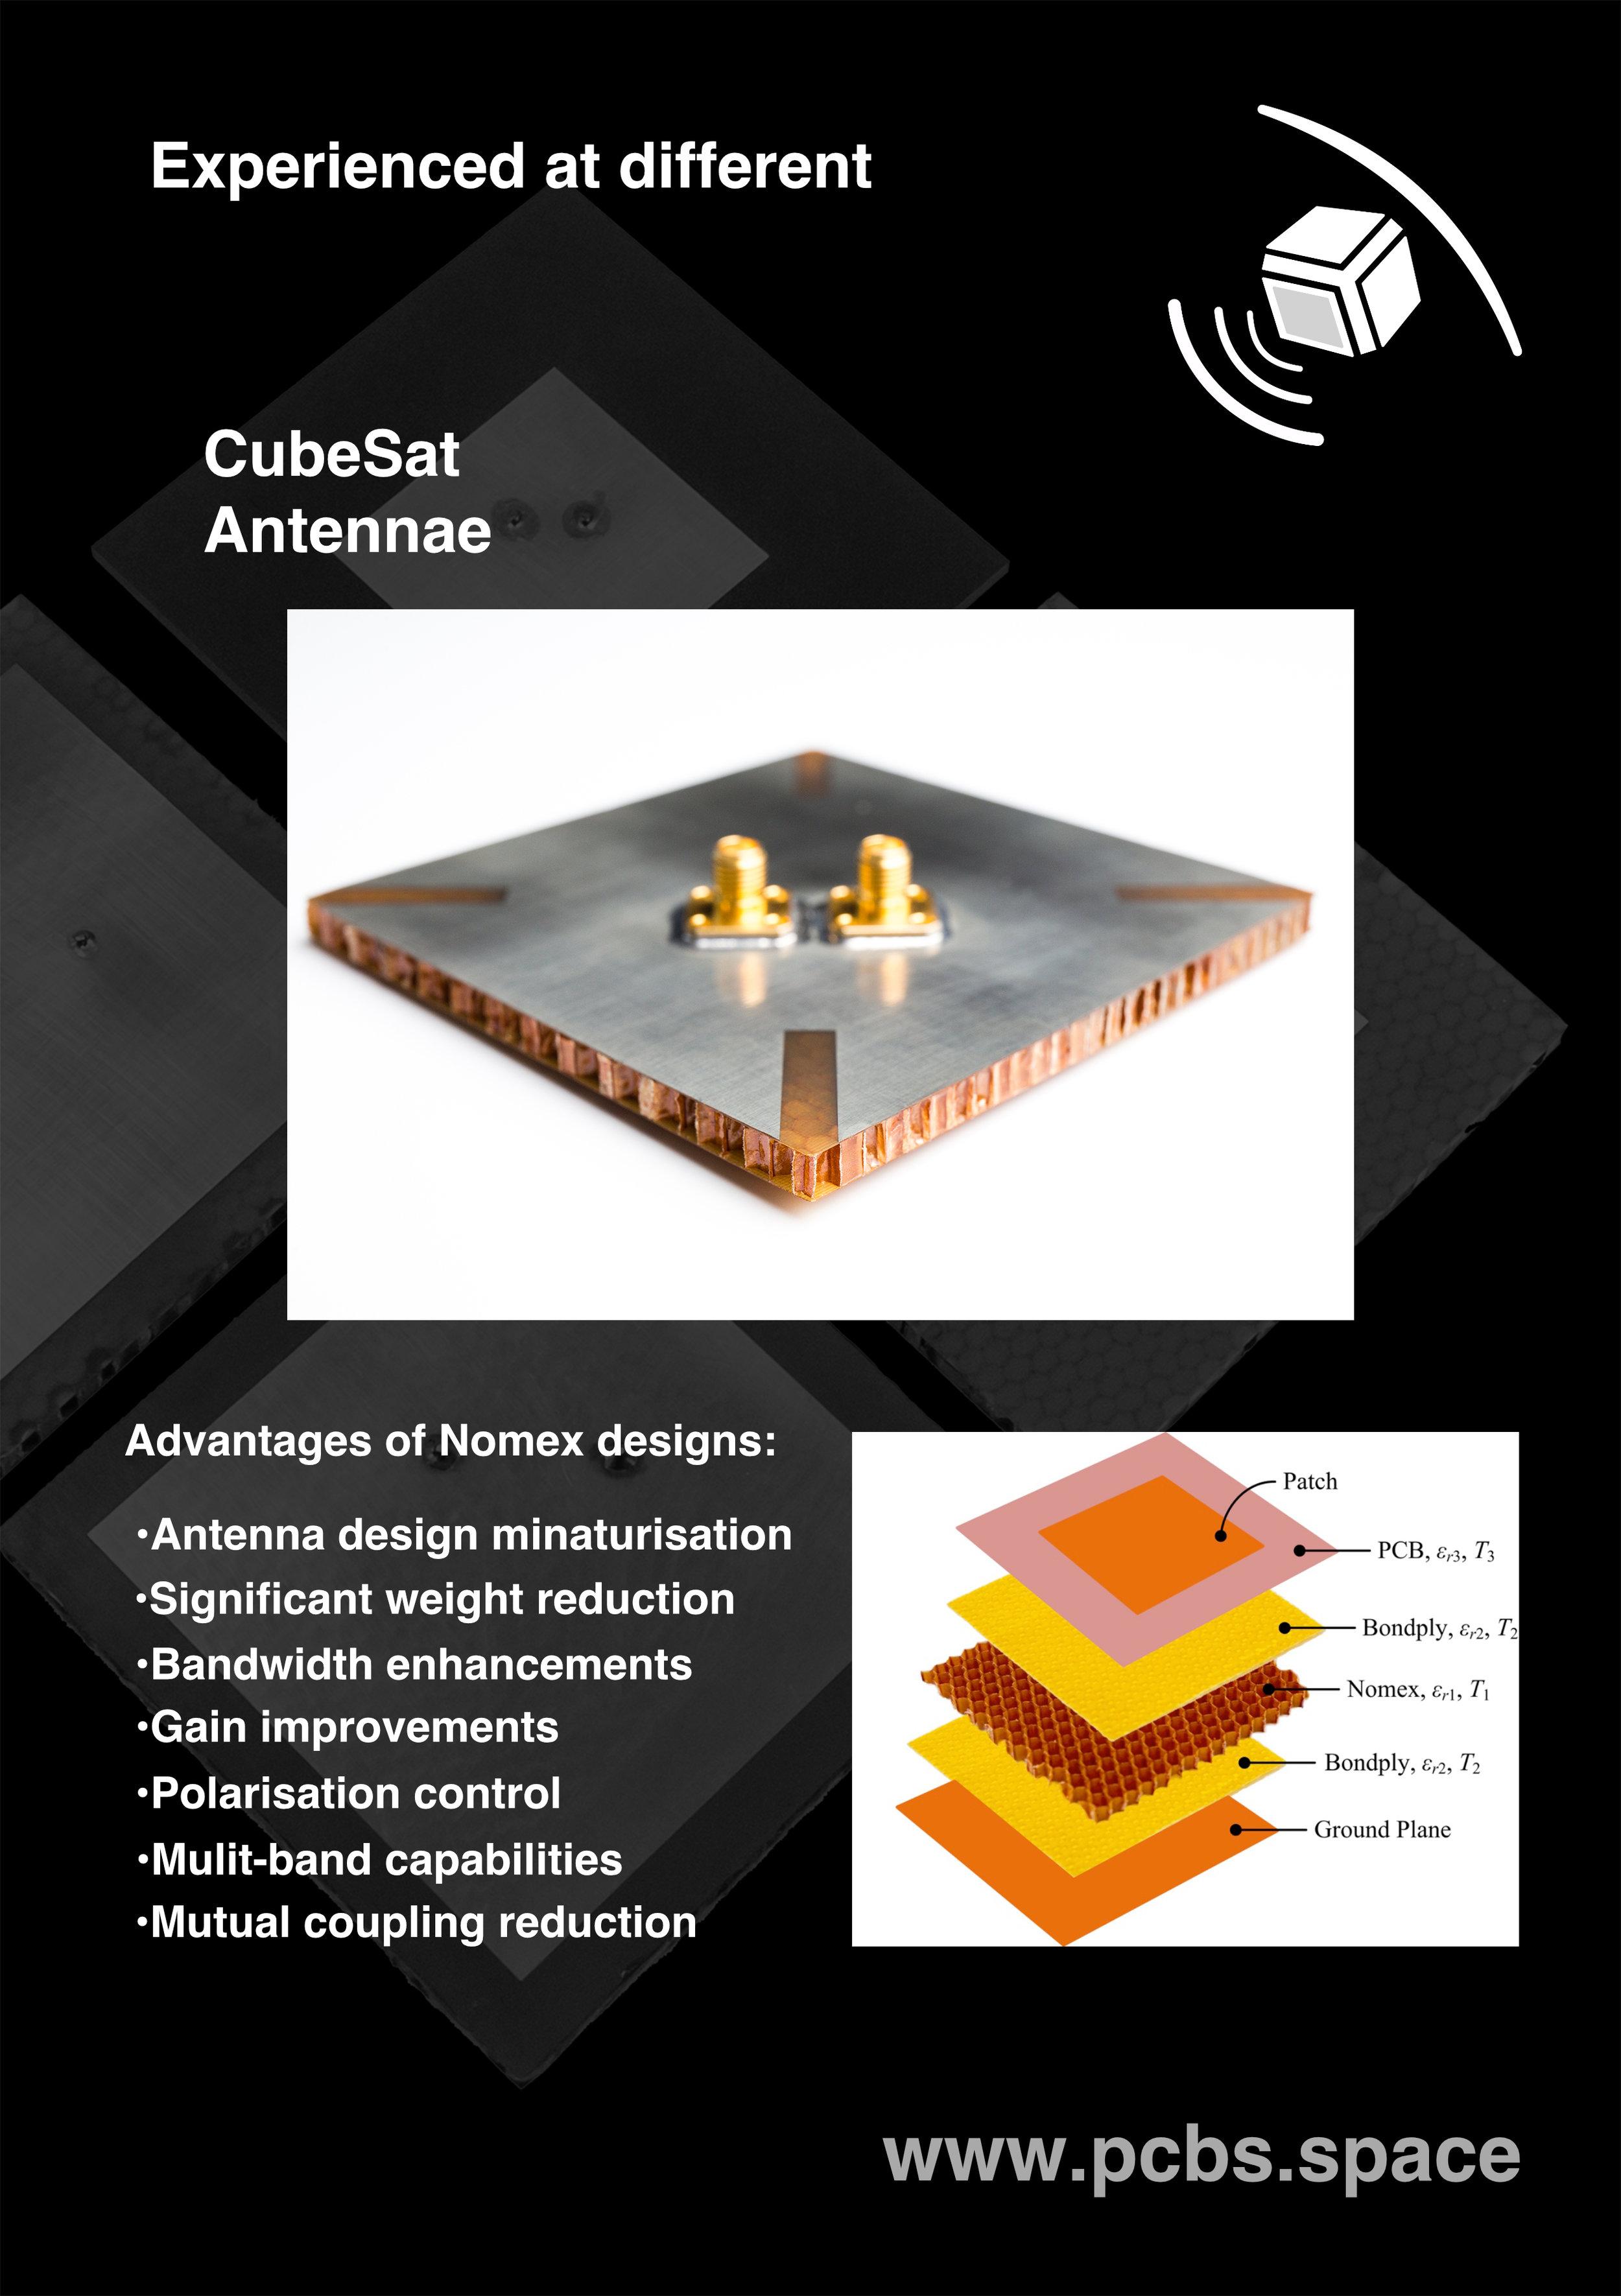 cube sat flyer v9 pcbsdotspace side 1.jpg